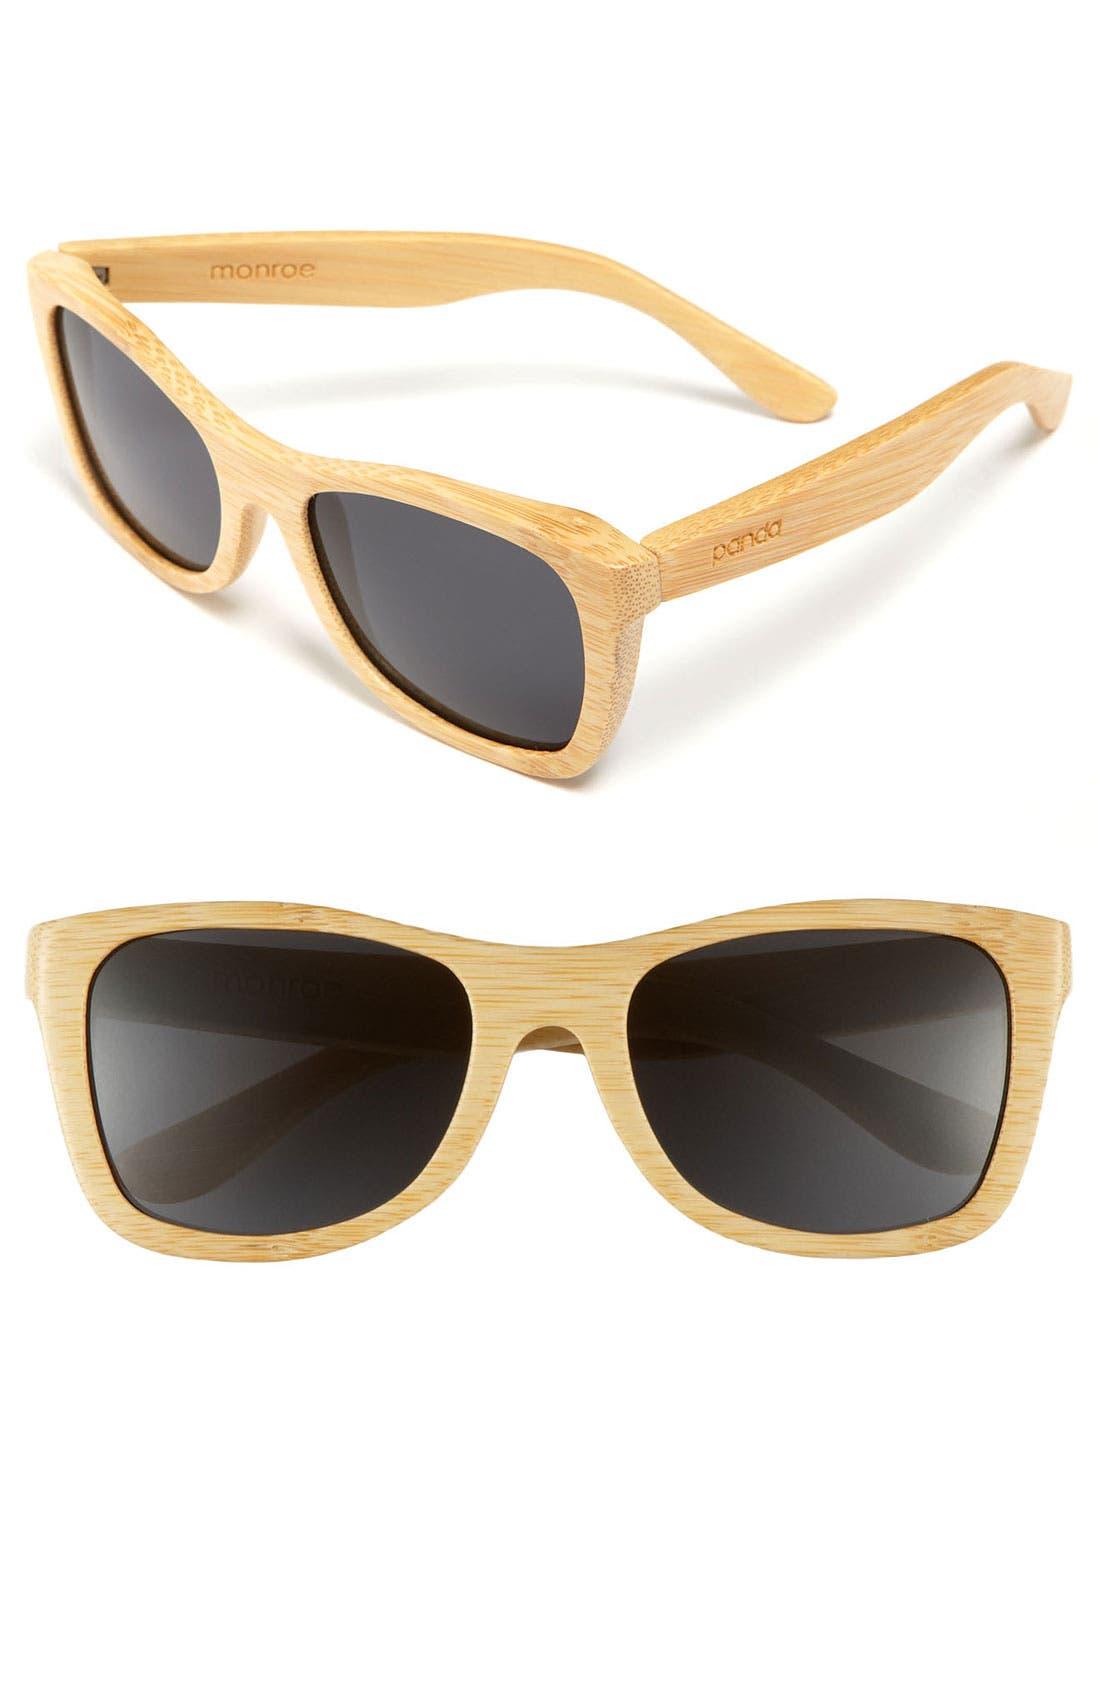 Main Image - Panda™ 'Monroe' Sunglasses